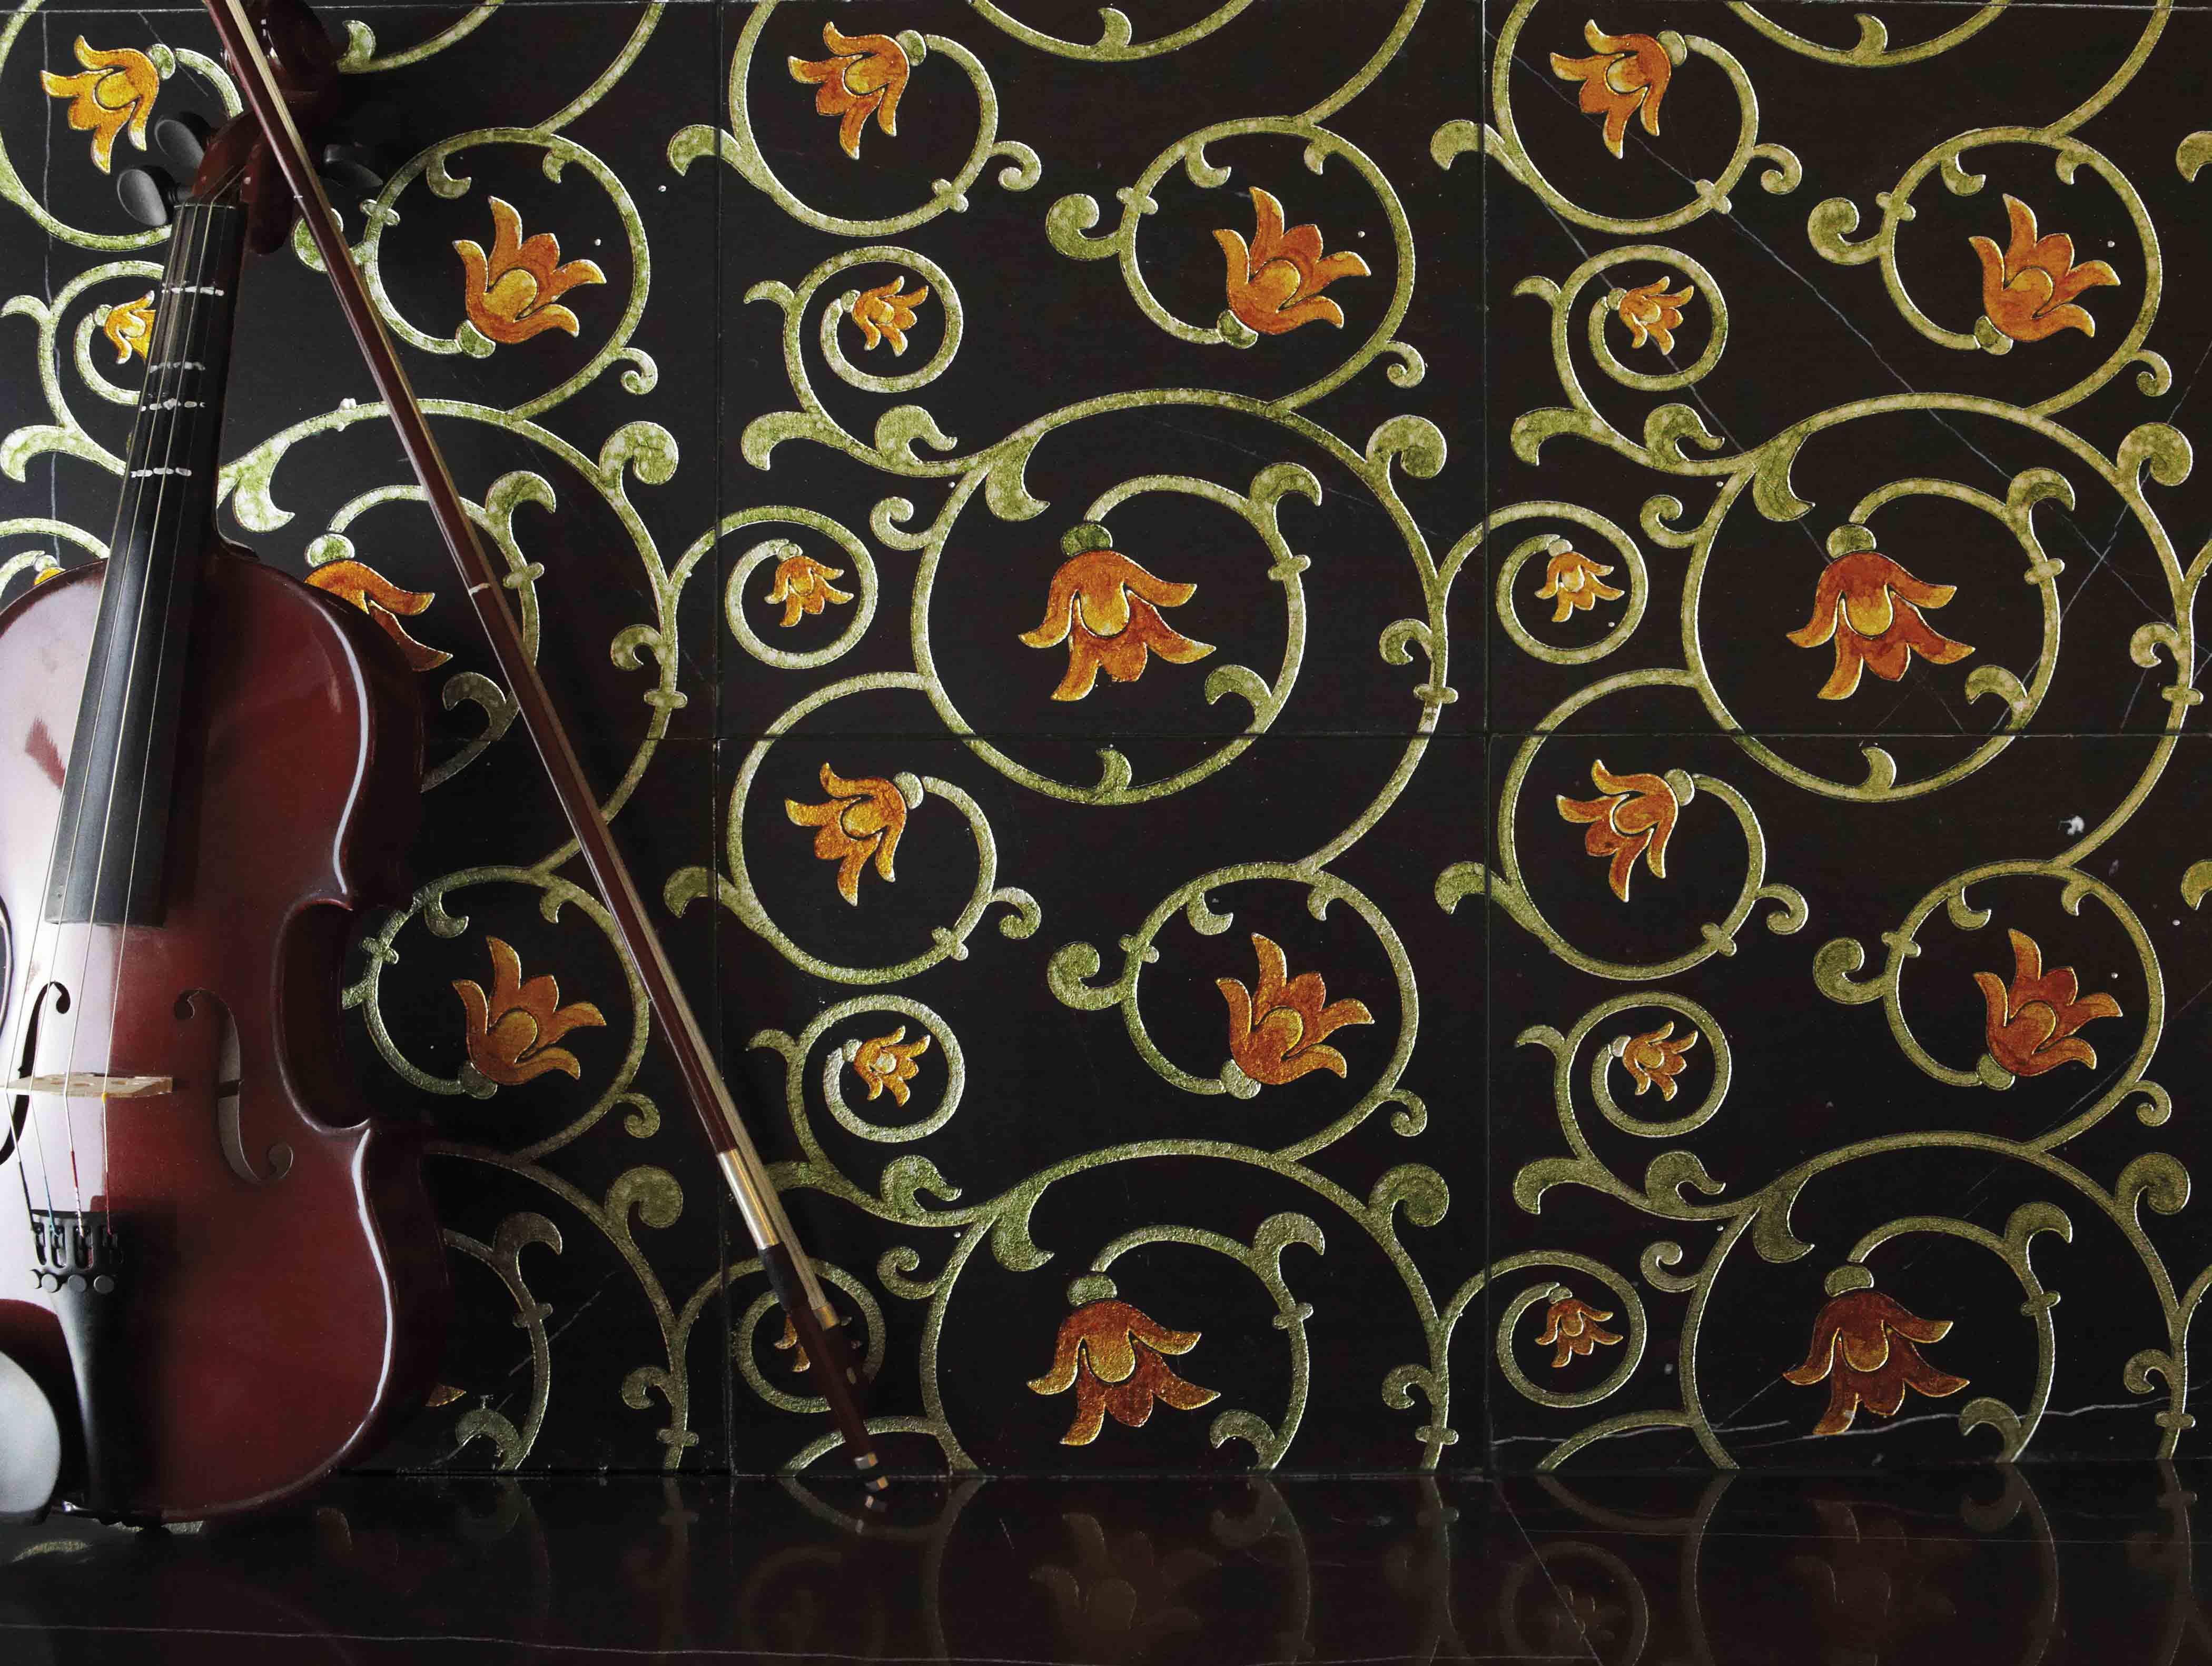 Lithos Mosaico italia Shirley 305 NERO - silver- verde, giallo